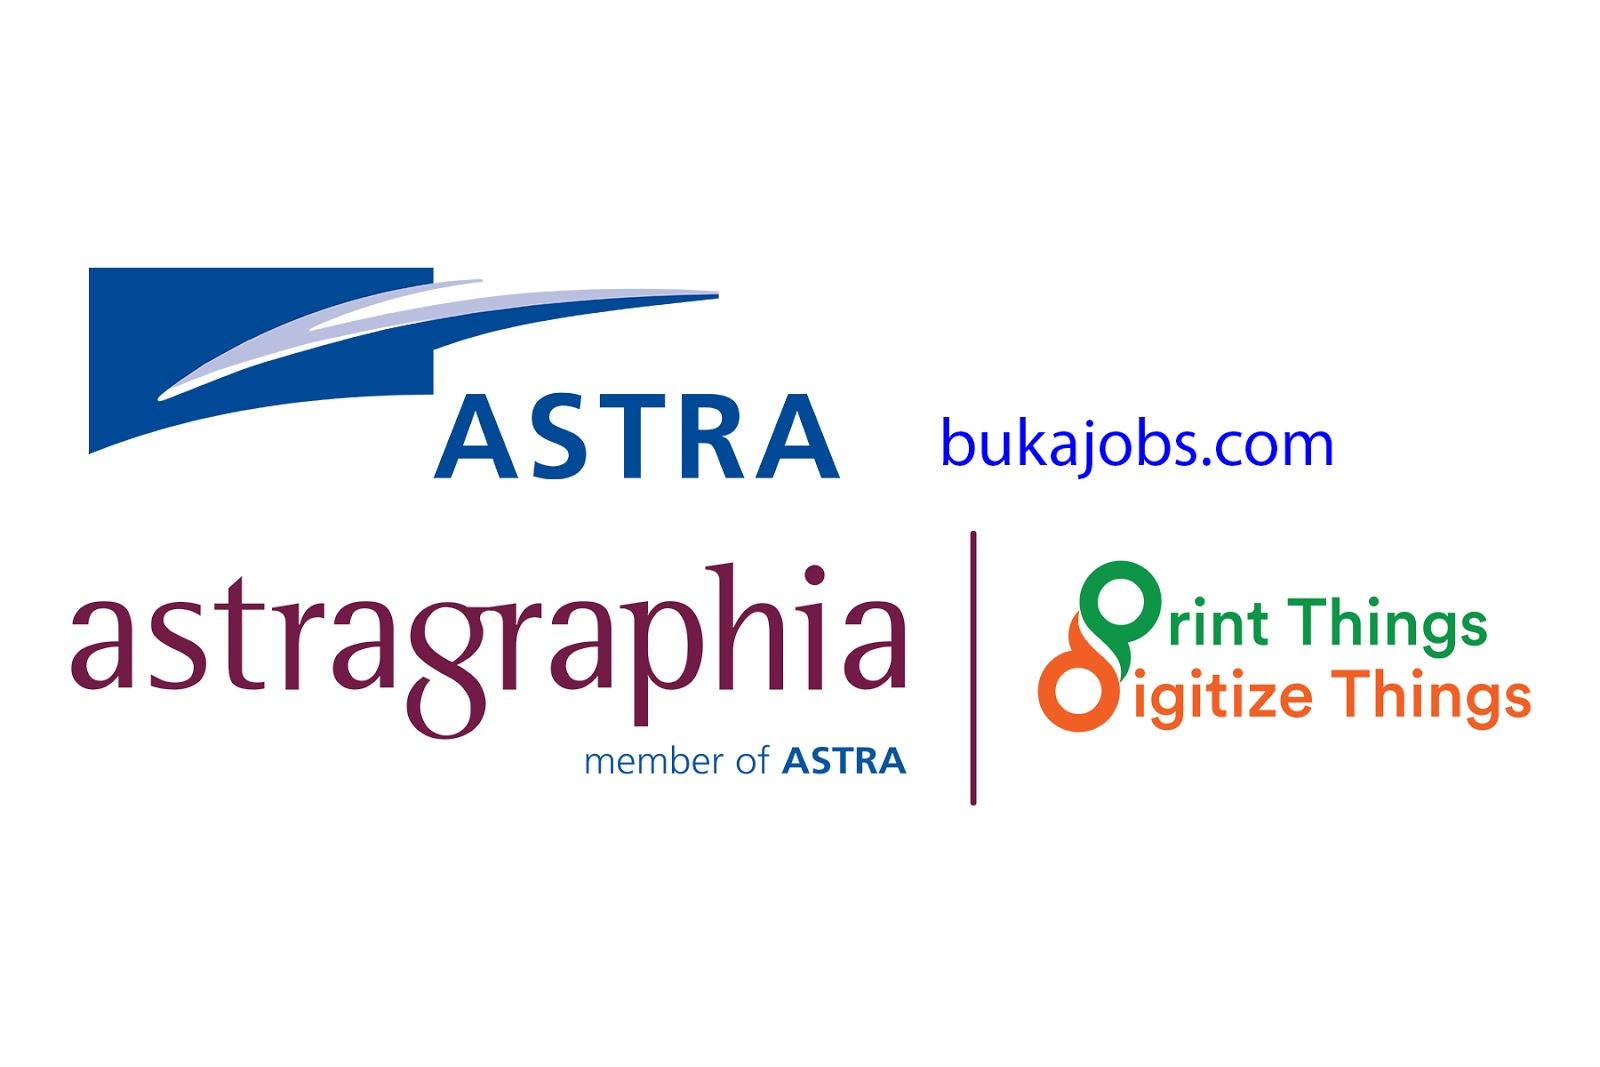 Lowongan Kerja PT. Astra Graphia Tbk 2019